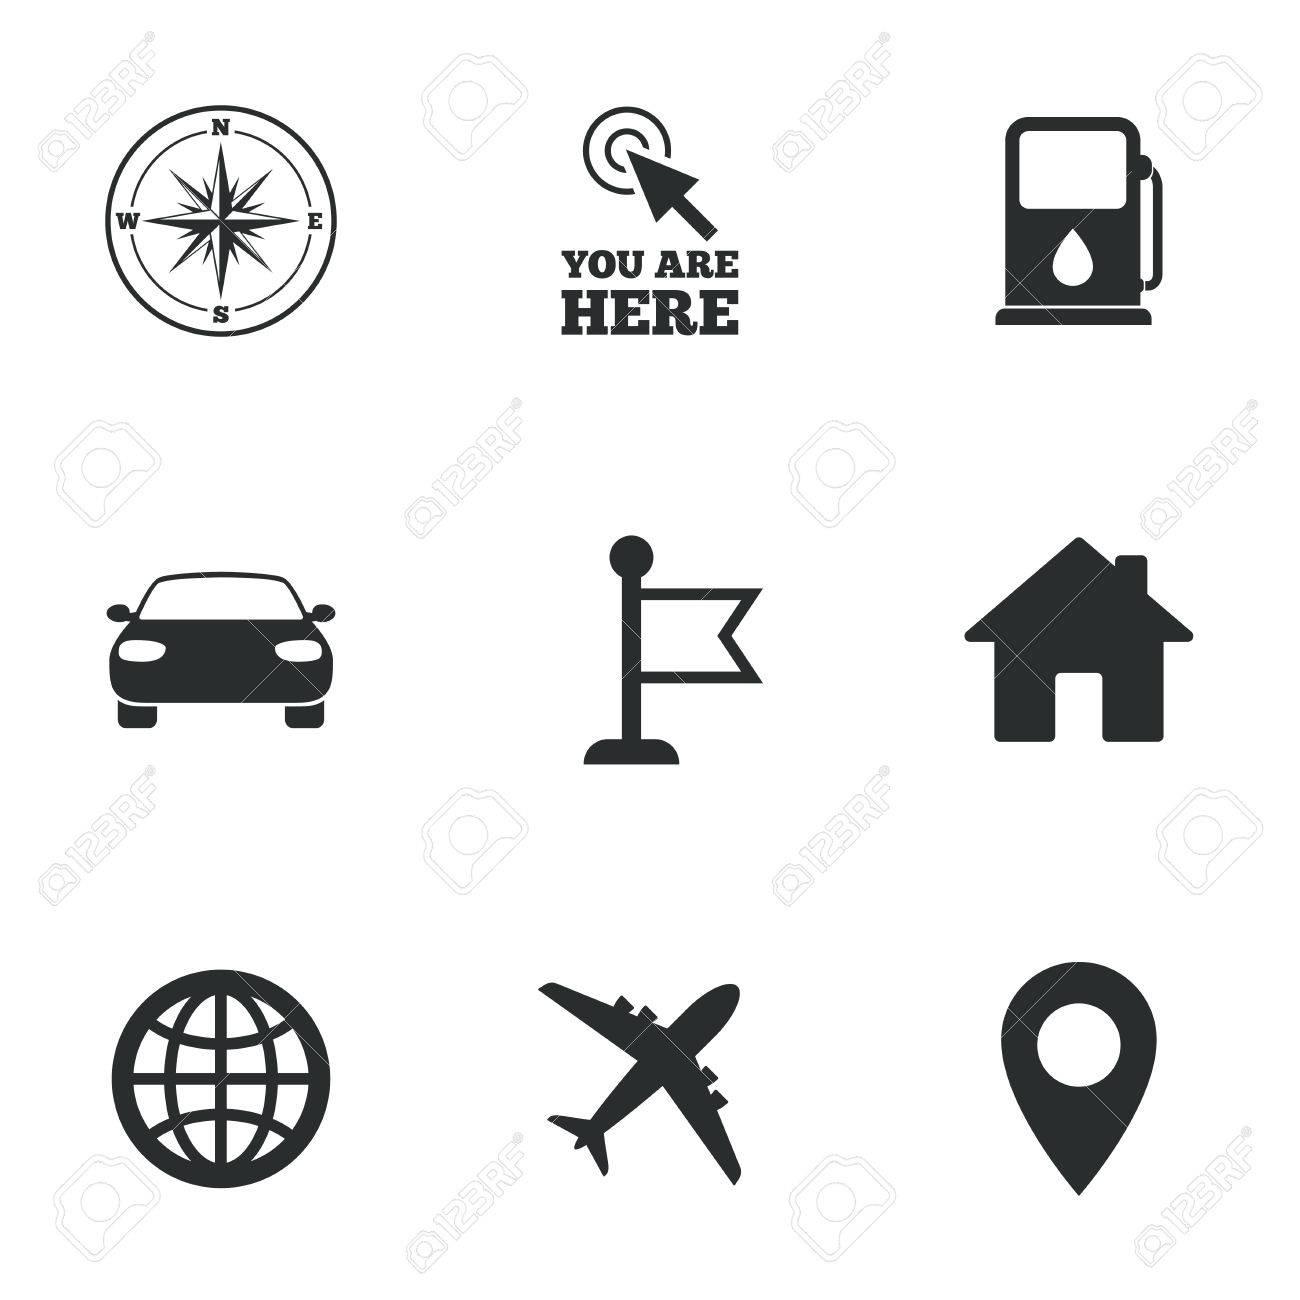 Medical Abbreviations Symbols Gallery Symbol Wan Network Topology